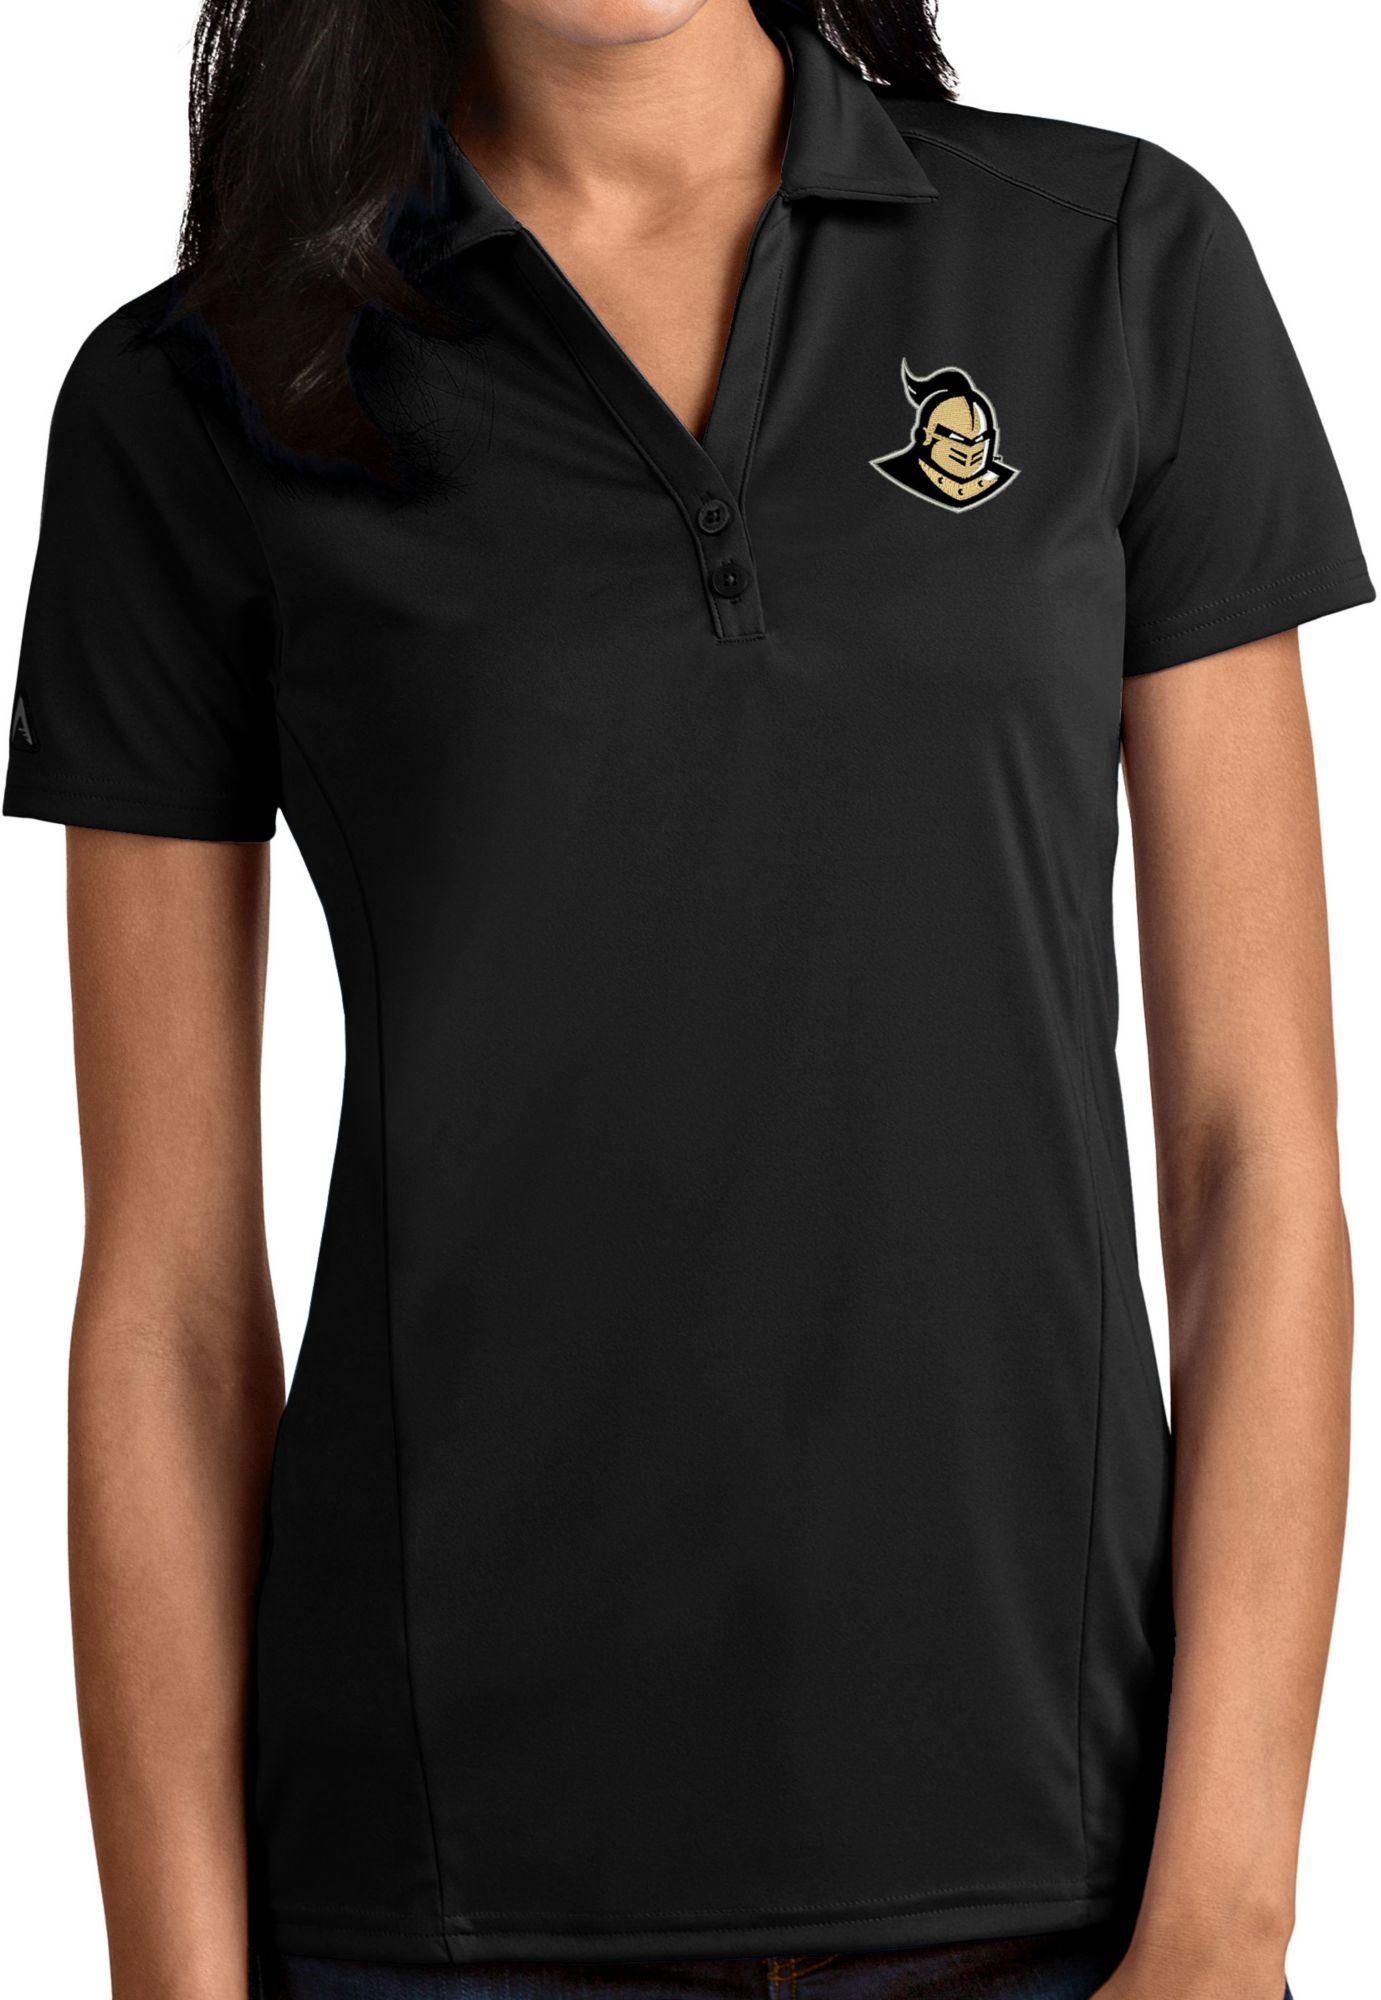 895ff20b Antigua Women's UCF Knights Tribute Black Polo, Size: Small in 2019 ...